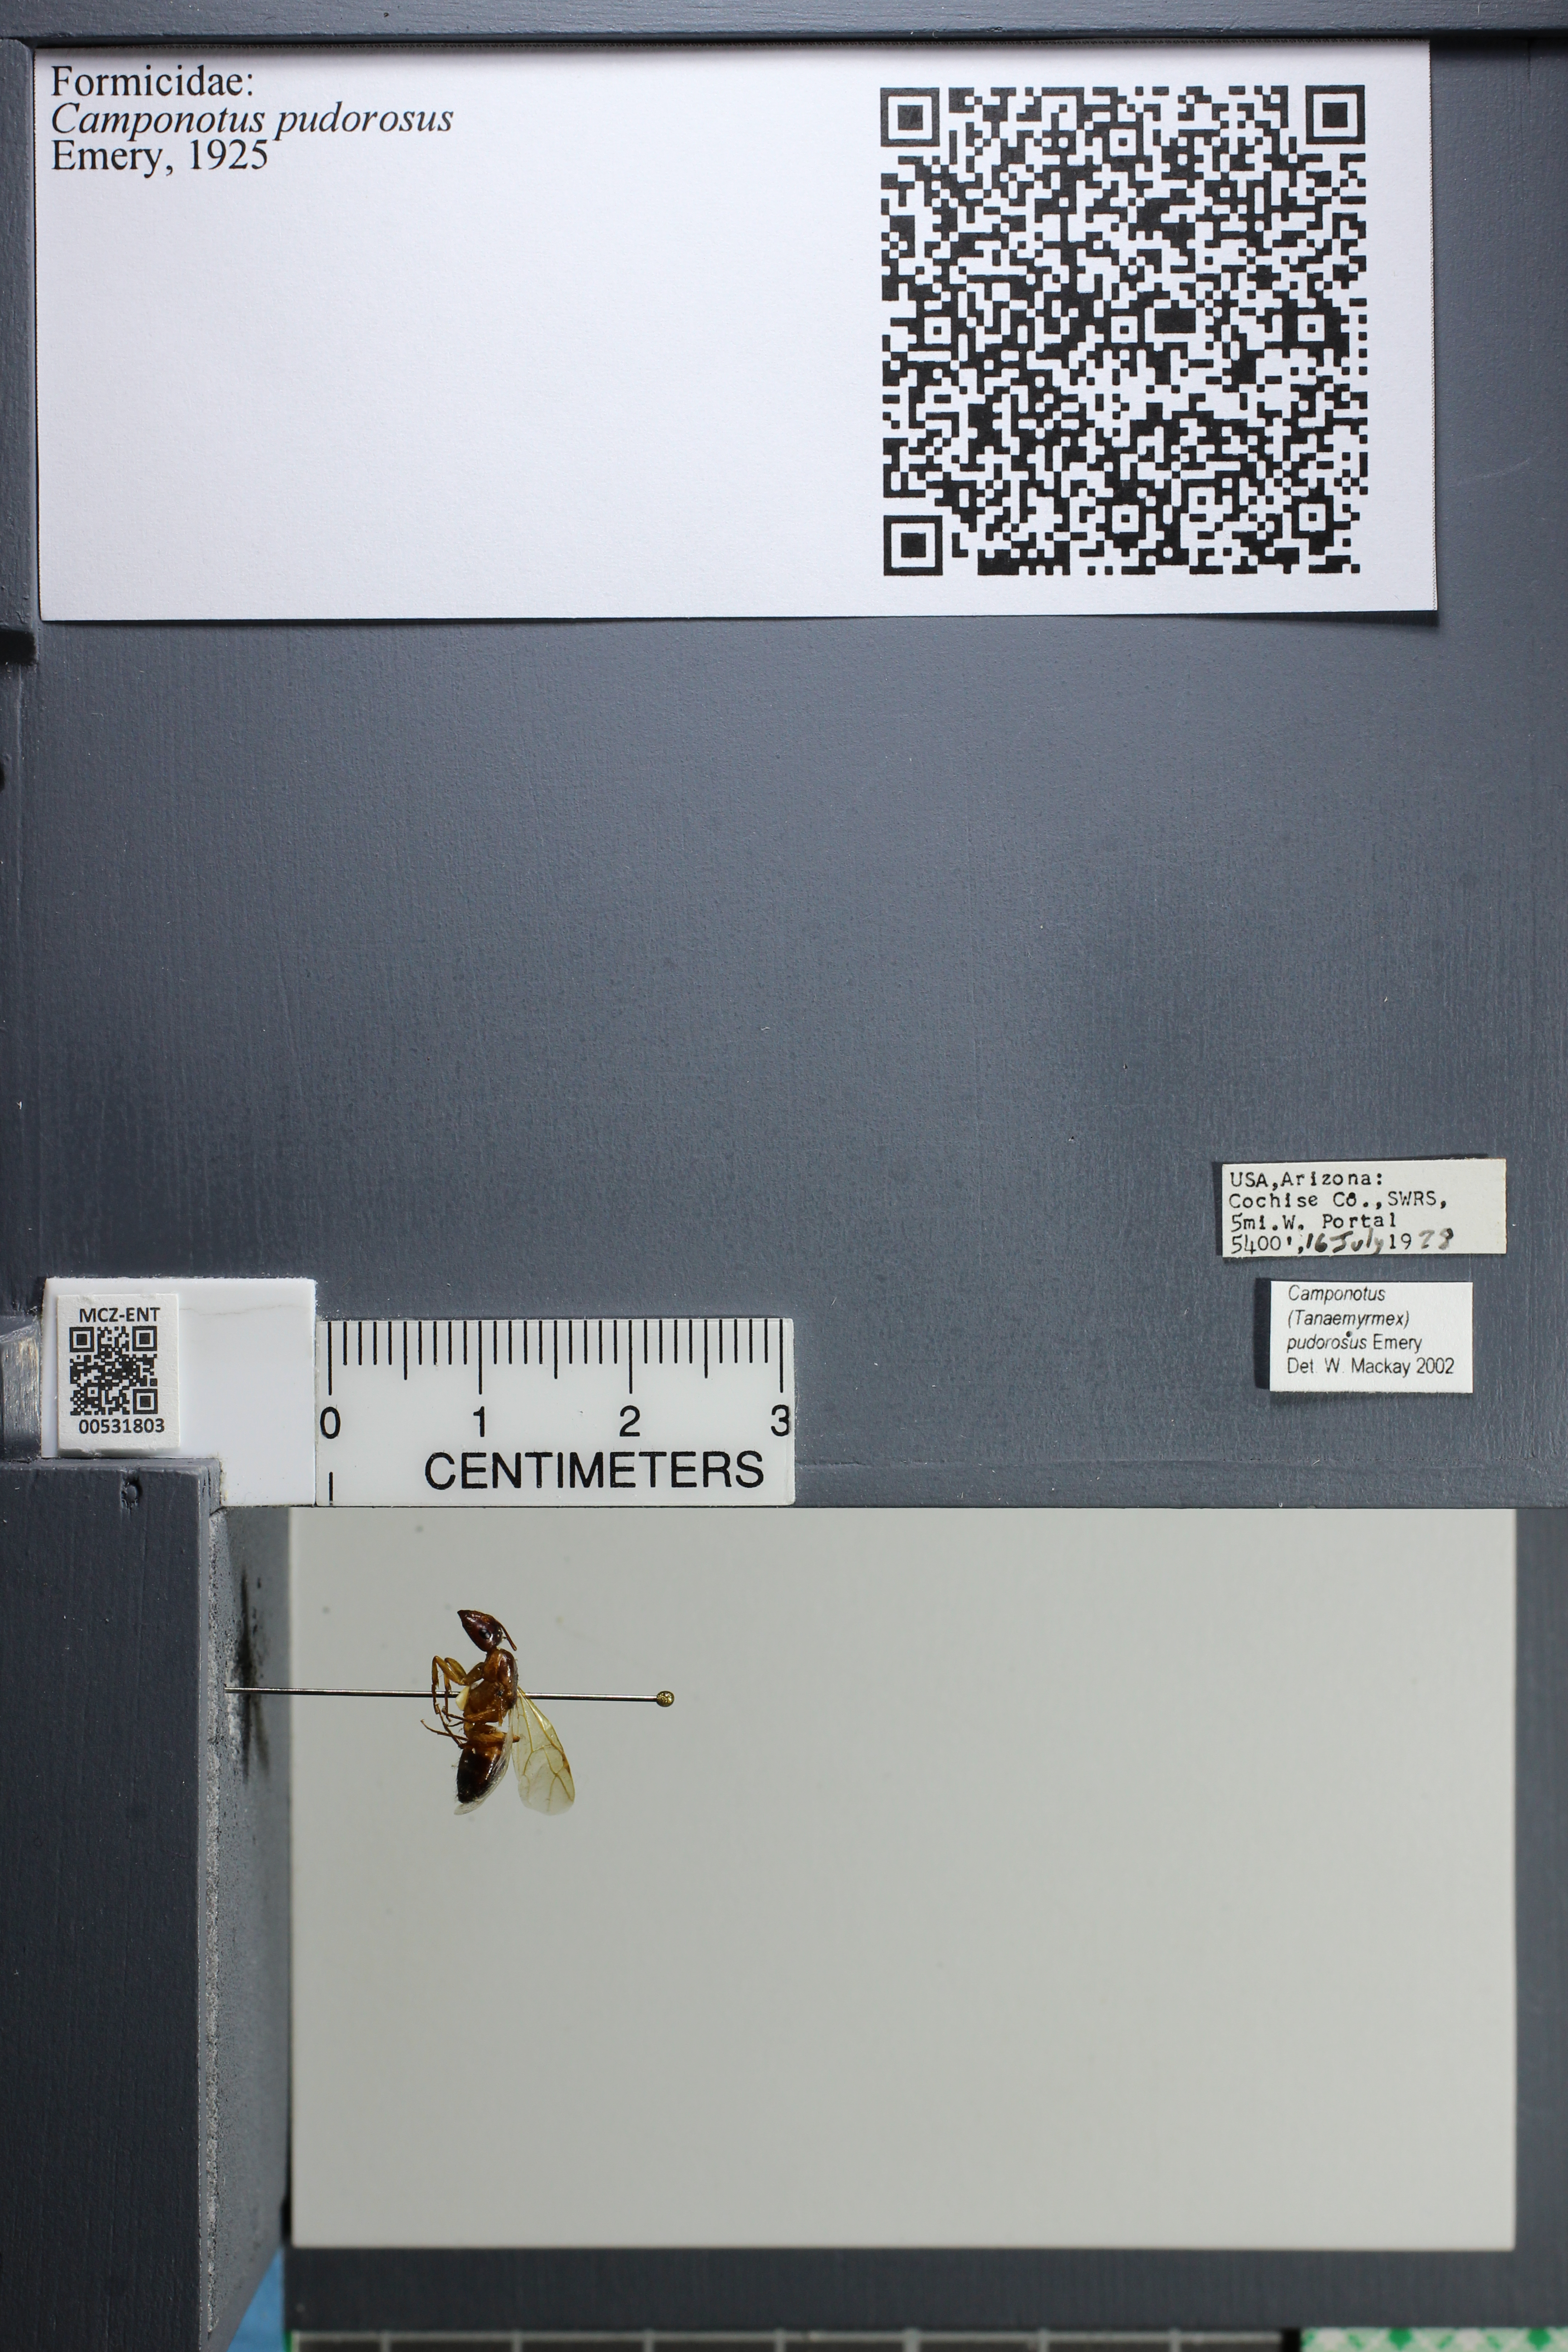 Image of Camponotus pudorosus